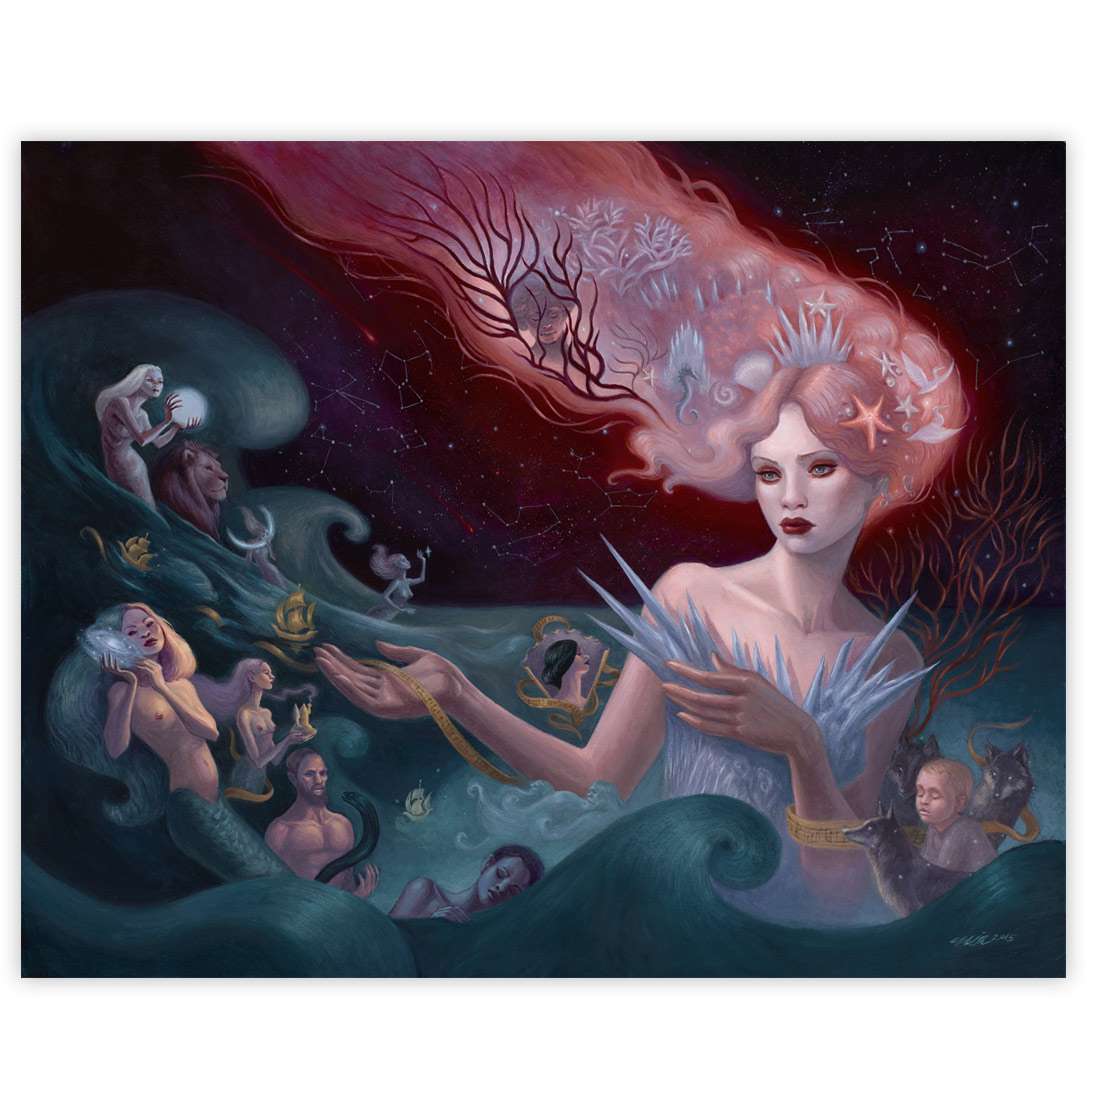 Mia Araujo Hymn To The Sea 16 x 20 Inches Acrylic on wood panel $2,400